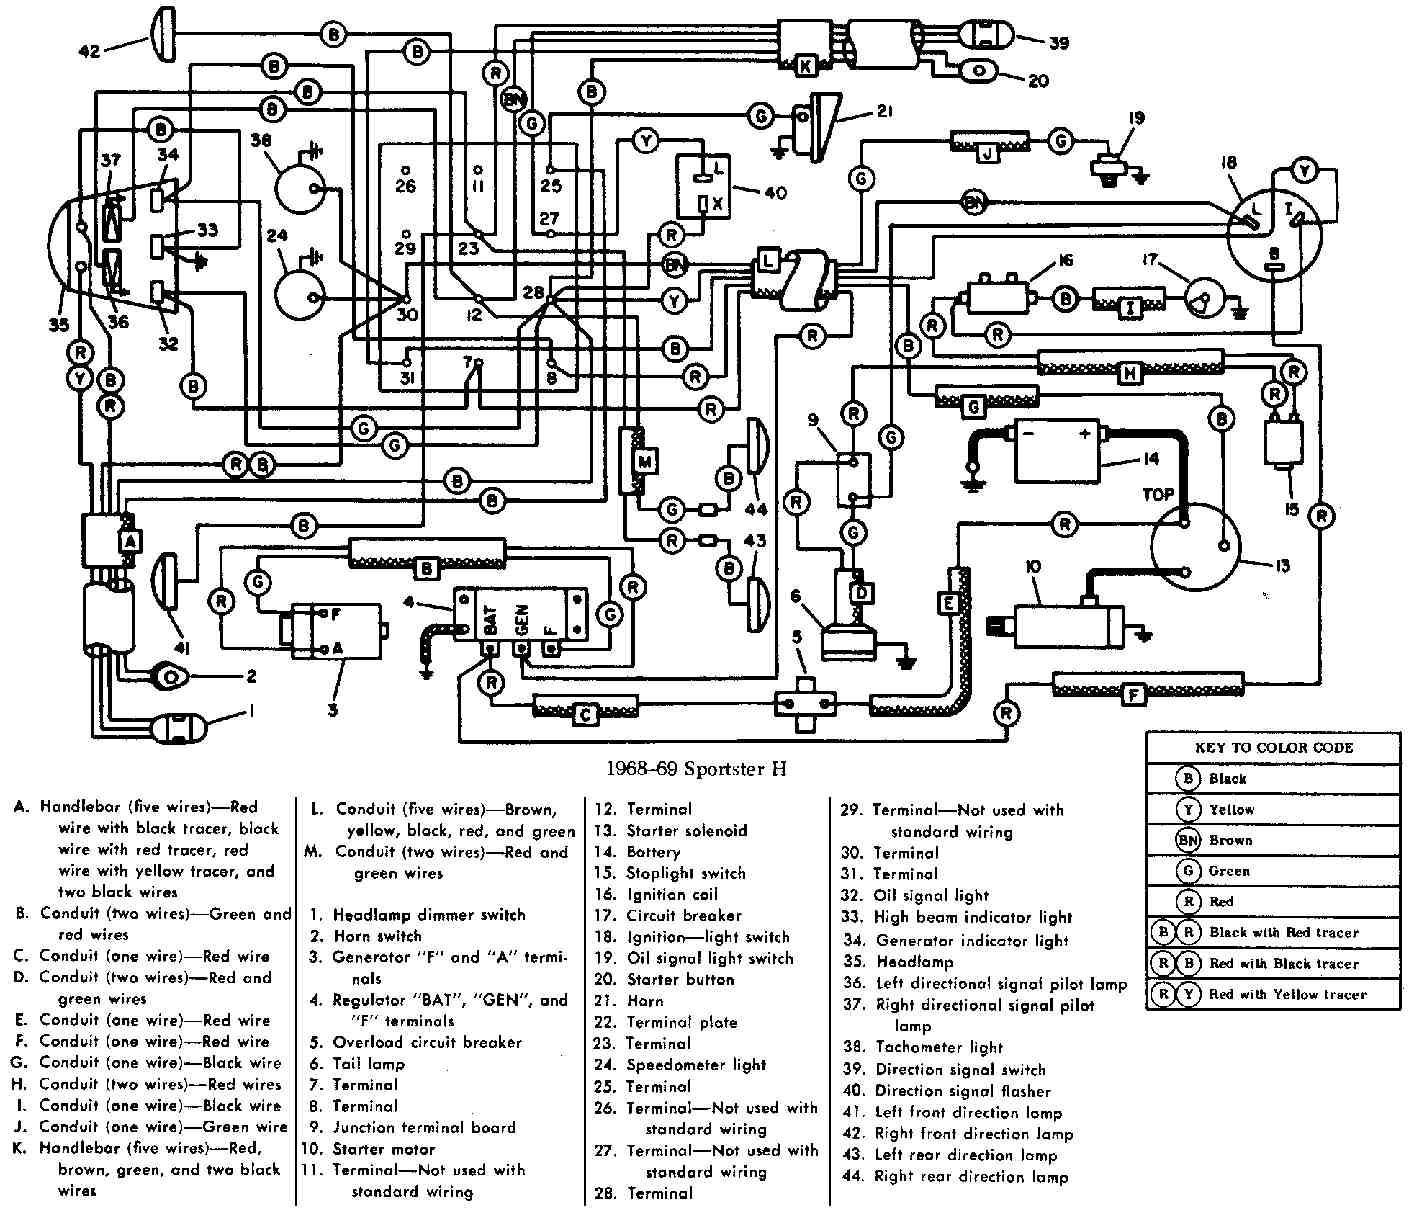 delco radio wire diagram colored wiring library1959 harley davidson wiring diagram diy wiring diagrams u2022 rh [ 1409 x 1218 Pixel ]